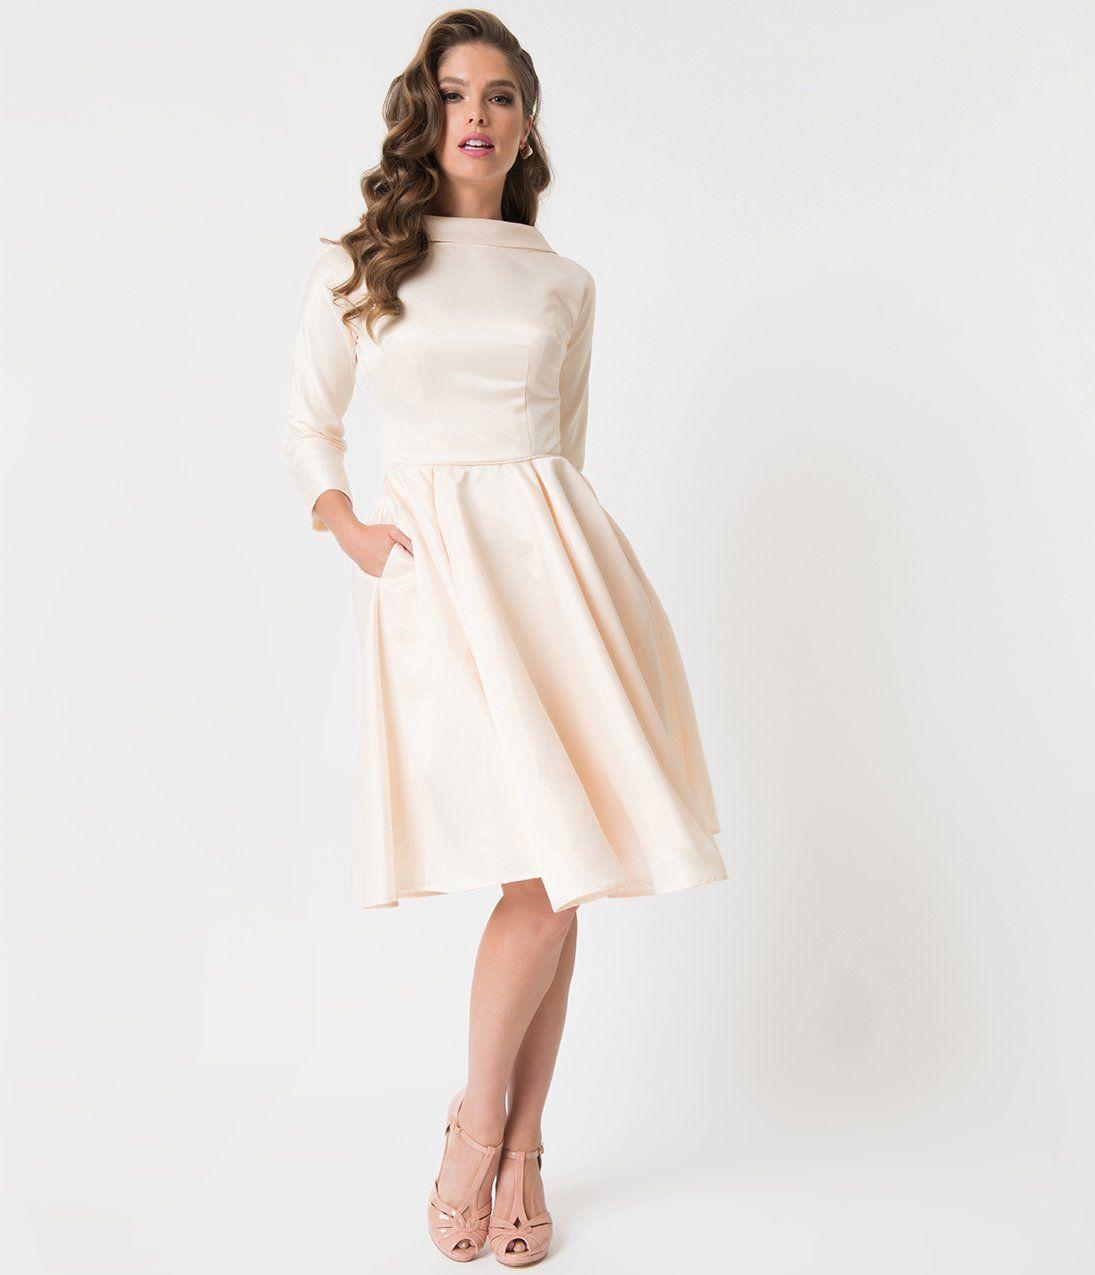 1950s style cream satin sleeved lana bridal dress in 2020